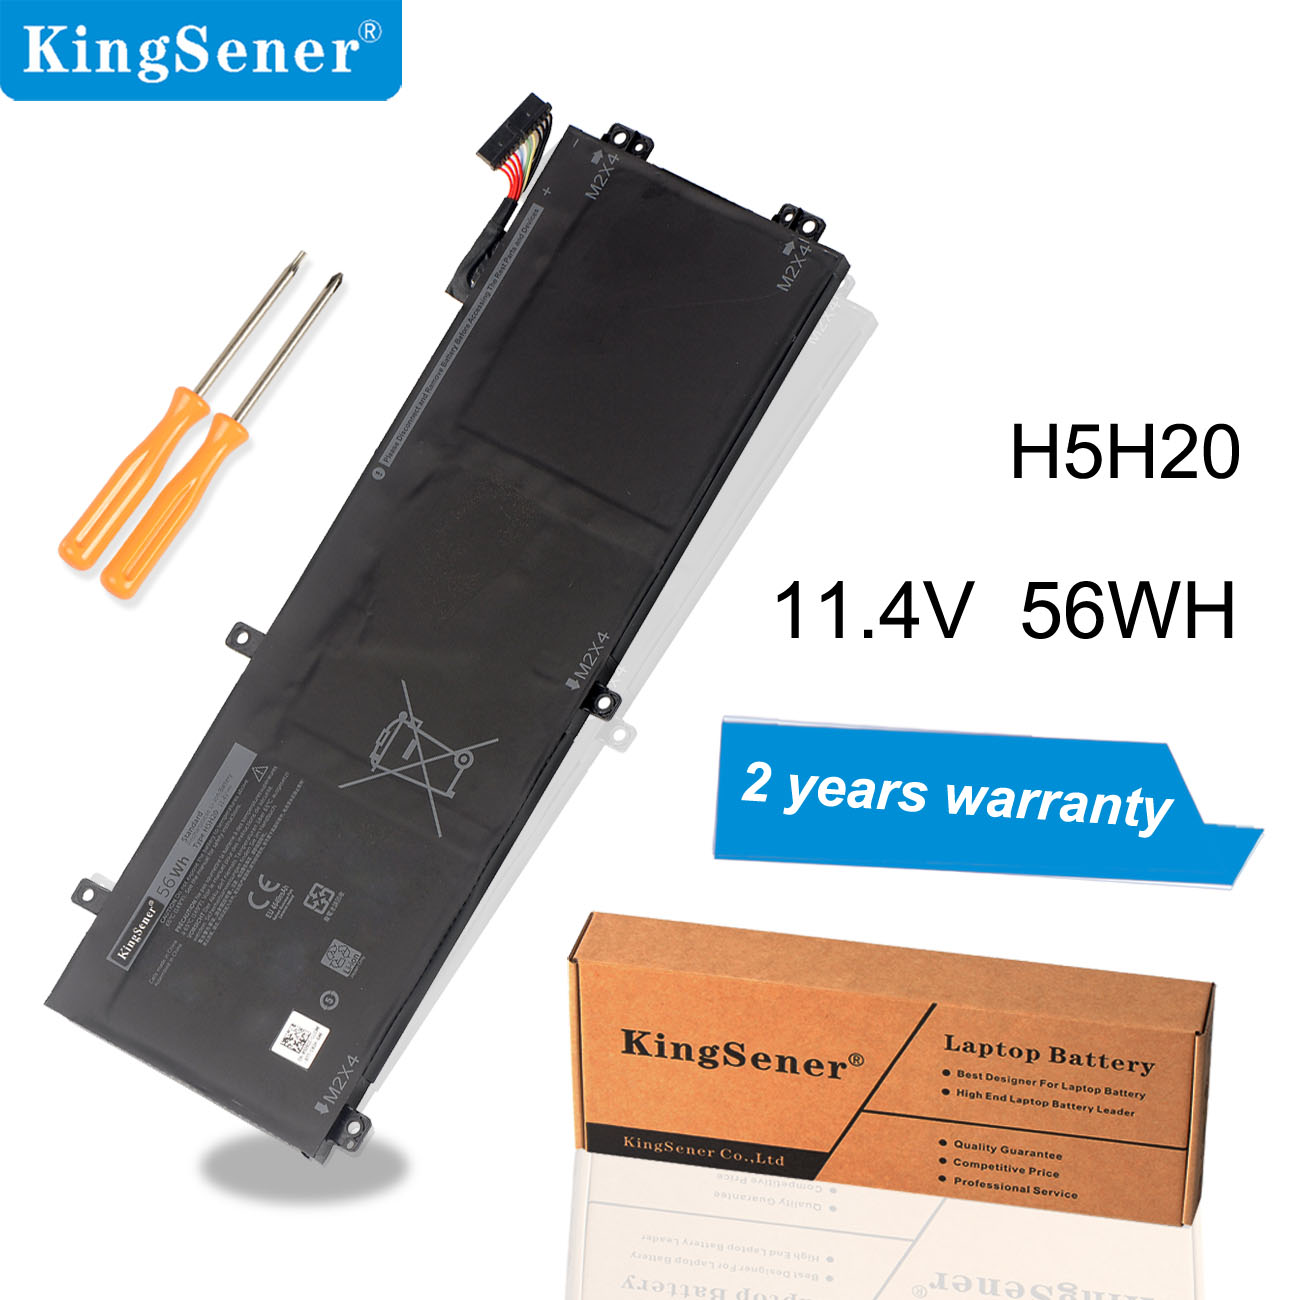 Kingsener H5H20 Laptop Battery For DELL XPS 15 9560 9570 15-9560-D1845 Precision M5520 5530 62MJV M7R96 05041C 5D91C 11.4V 56Wh